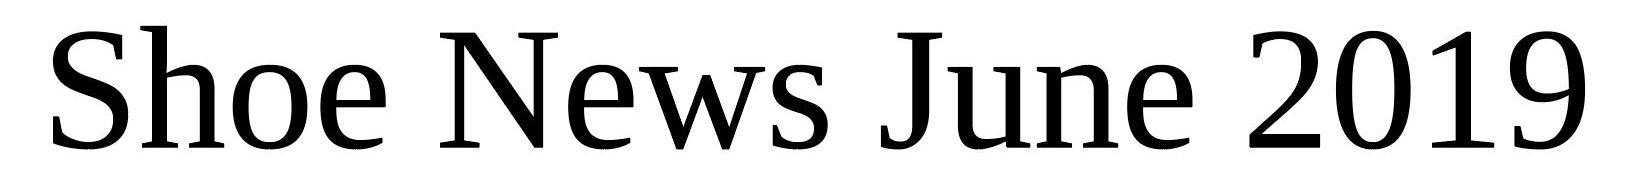 Shoe News June 2019 Misiu Academy